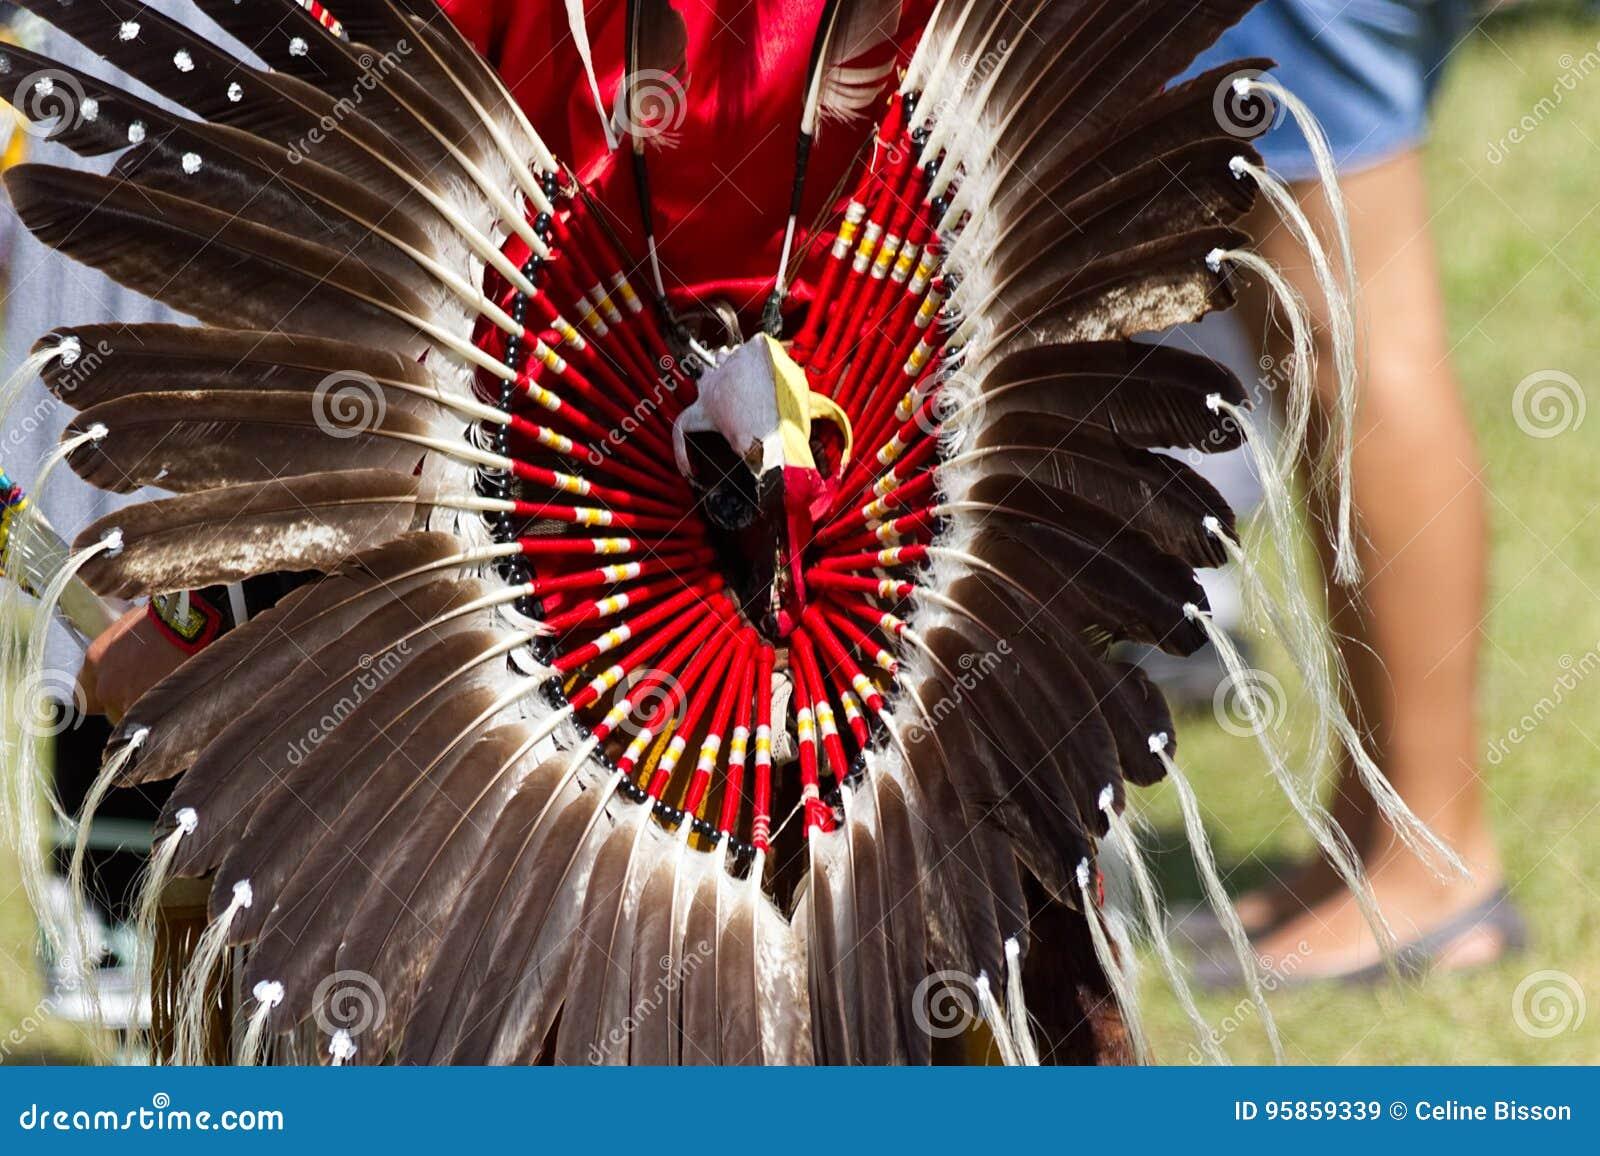 Pow wow στις 27ες ετήσιες ηχώ Kahnawake ενός υπερήφανου έθνους